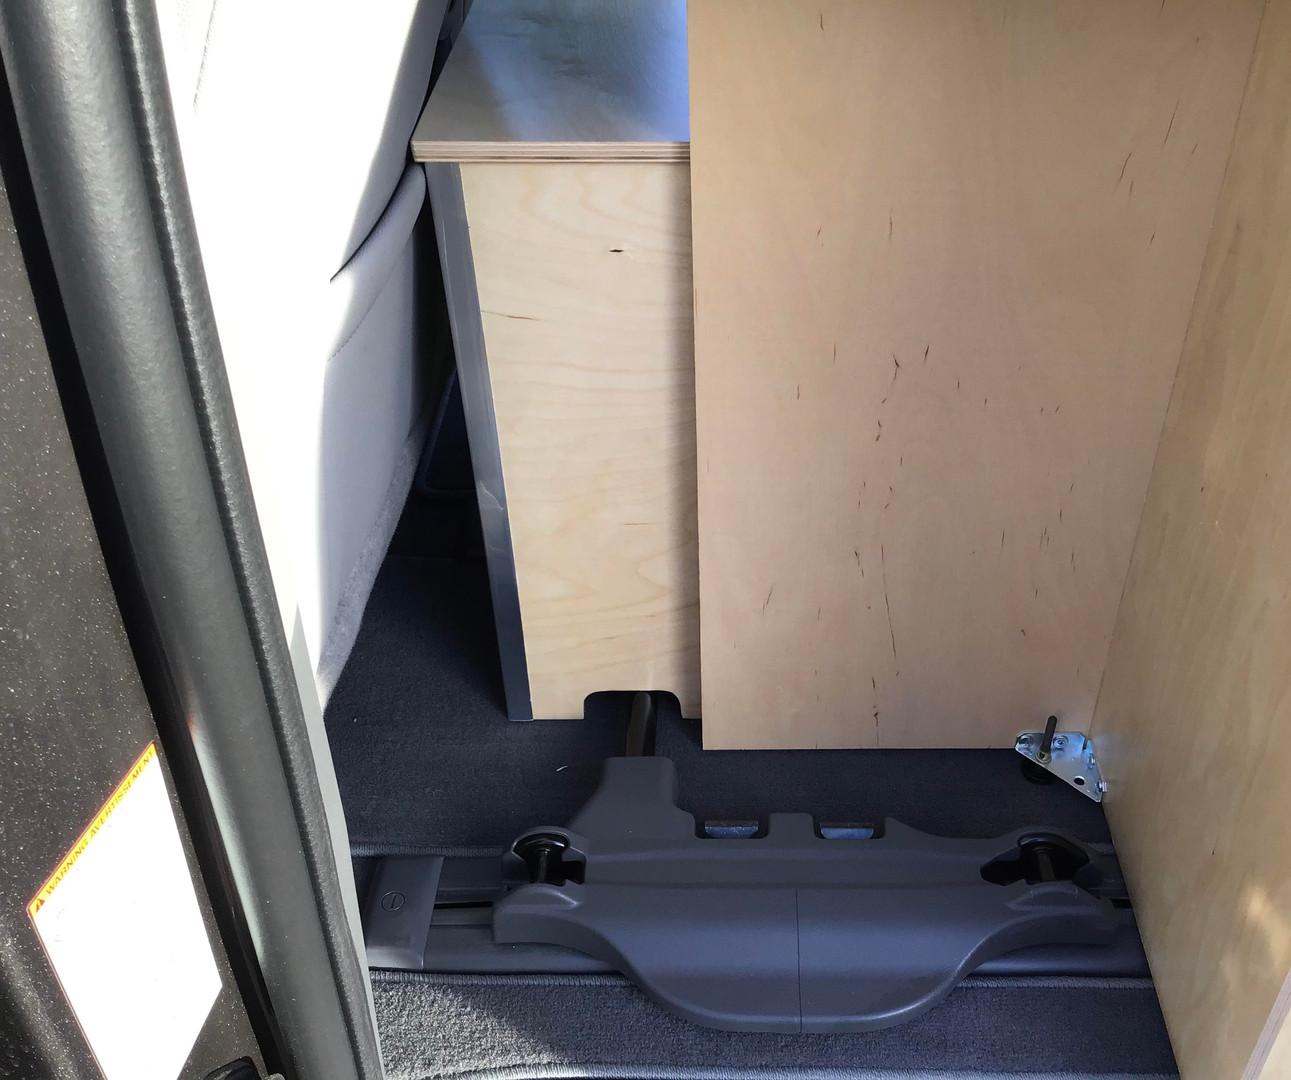 cab 2.jpg